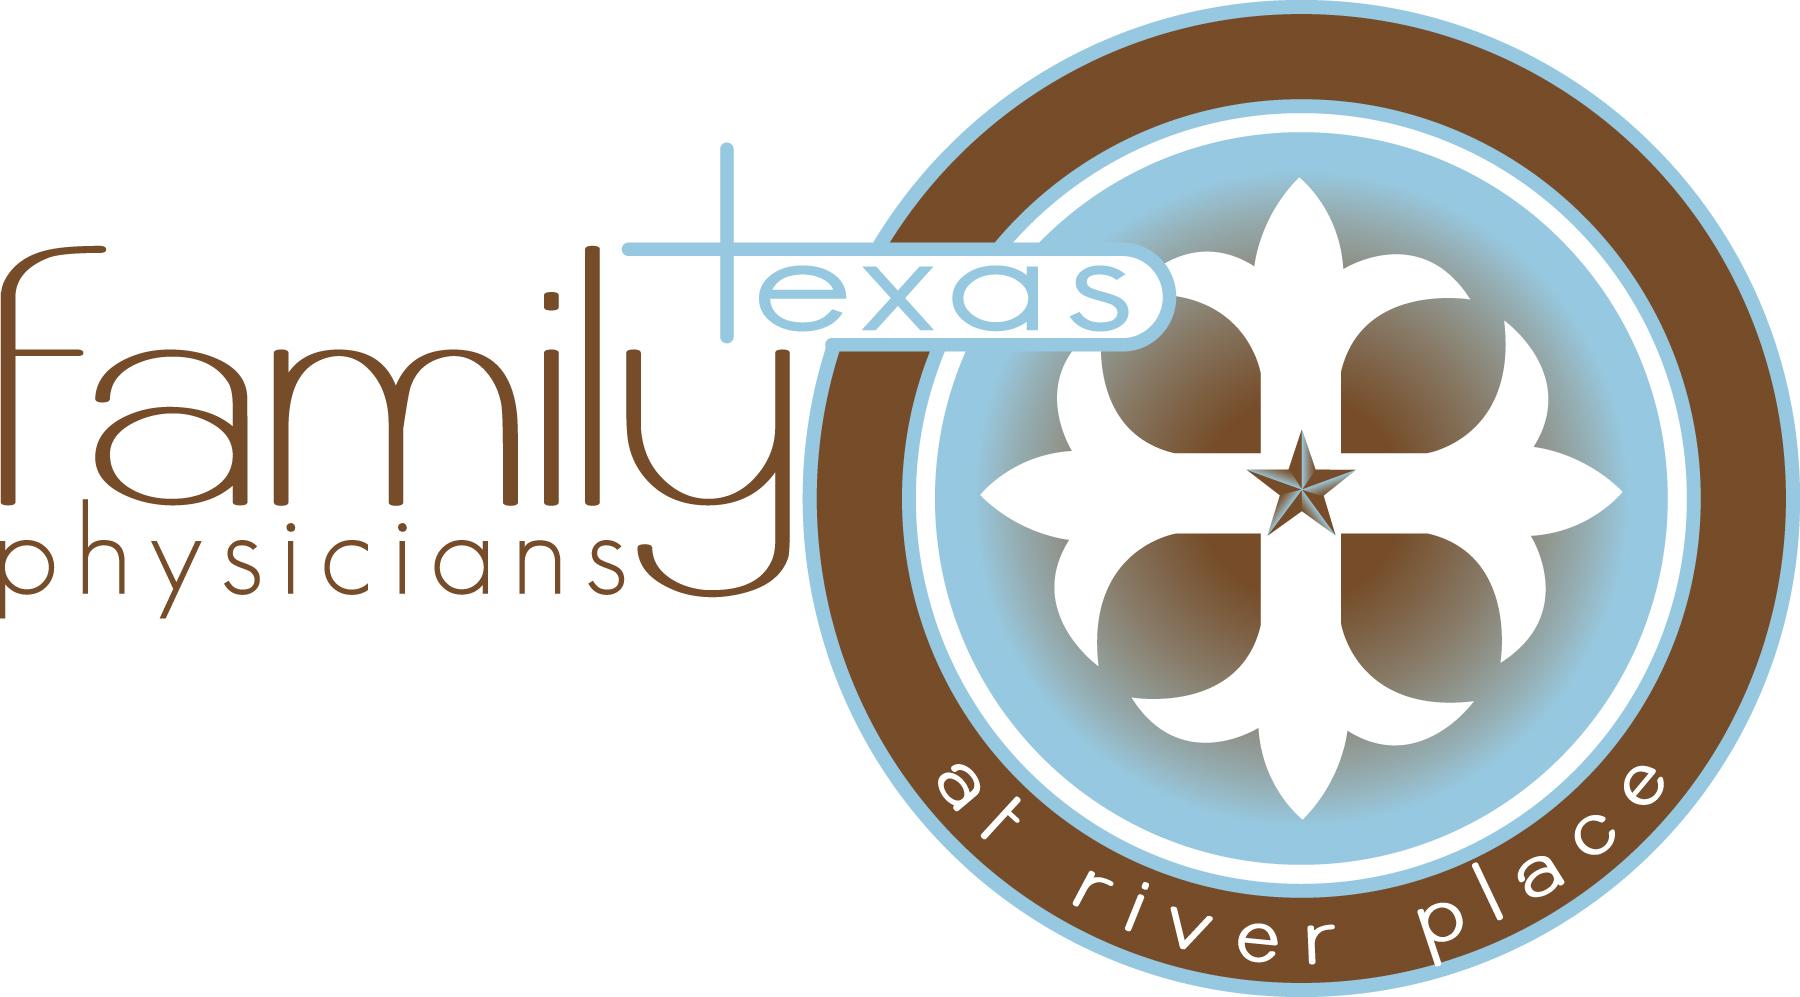 Texas Family Physicians